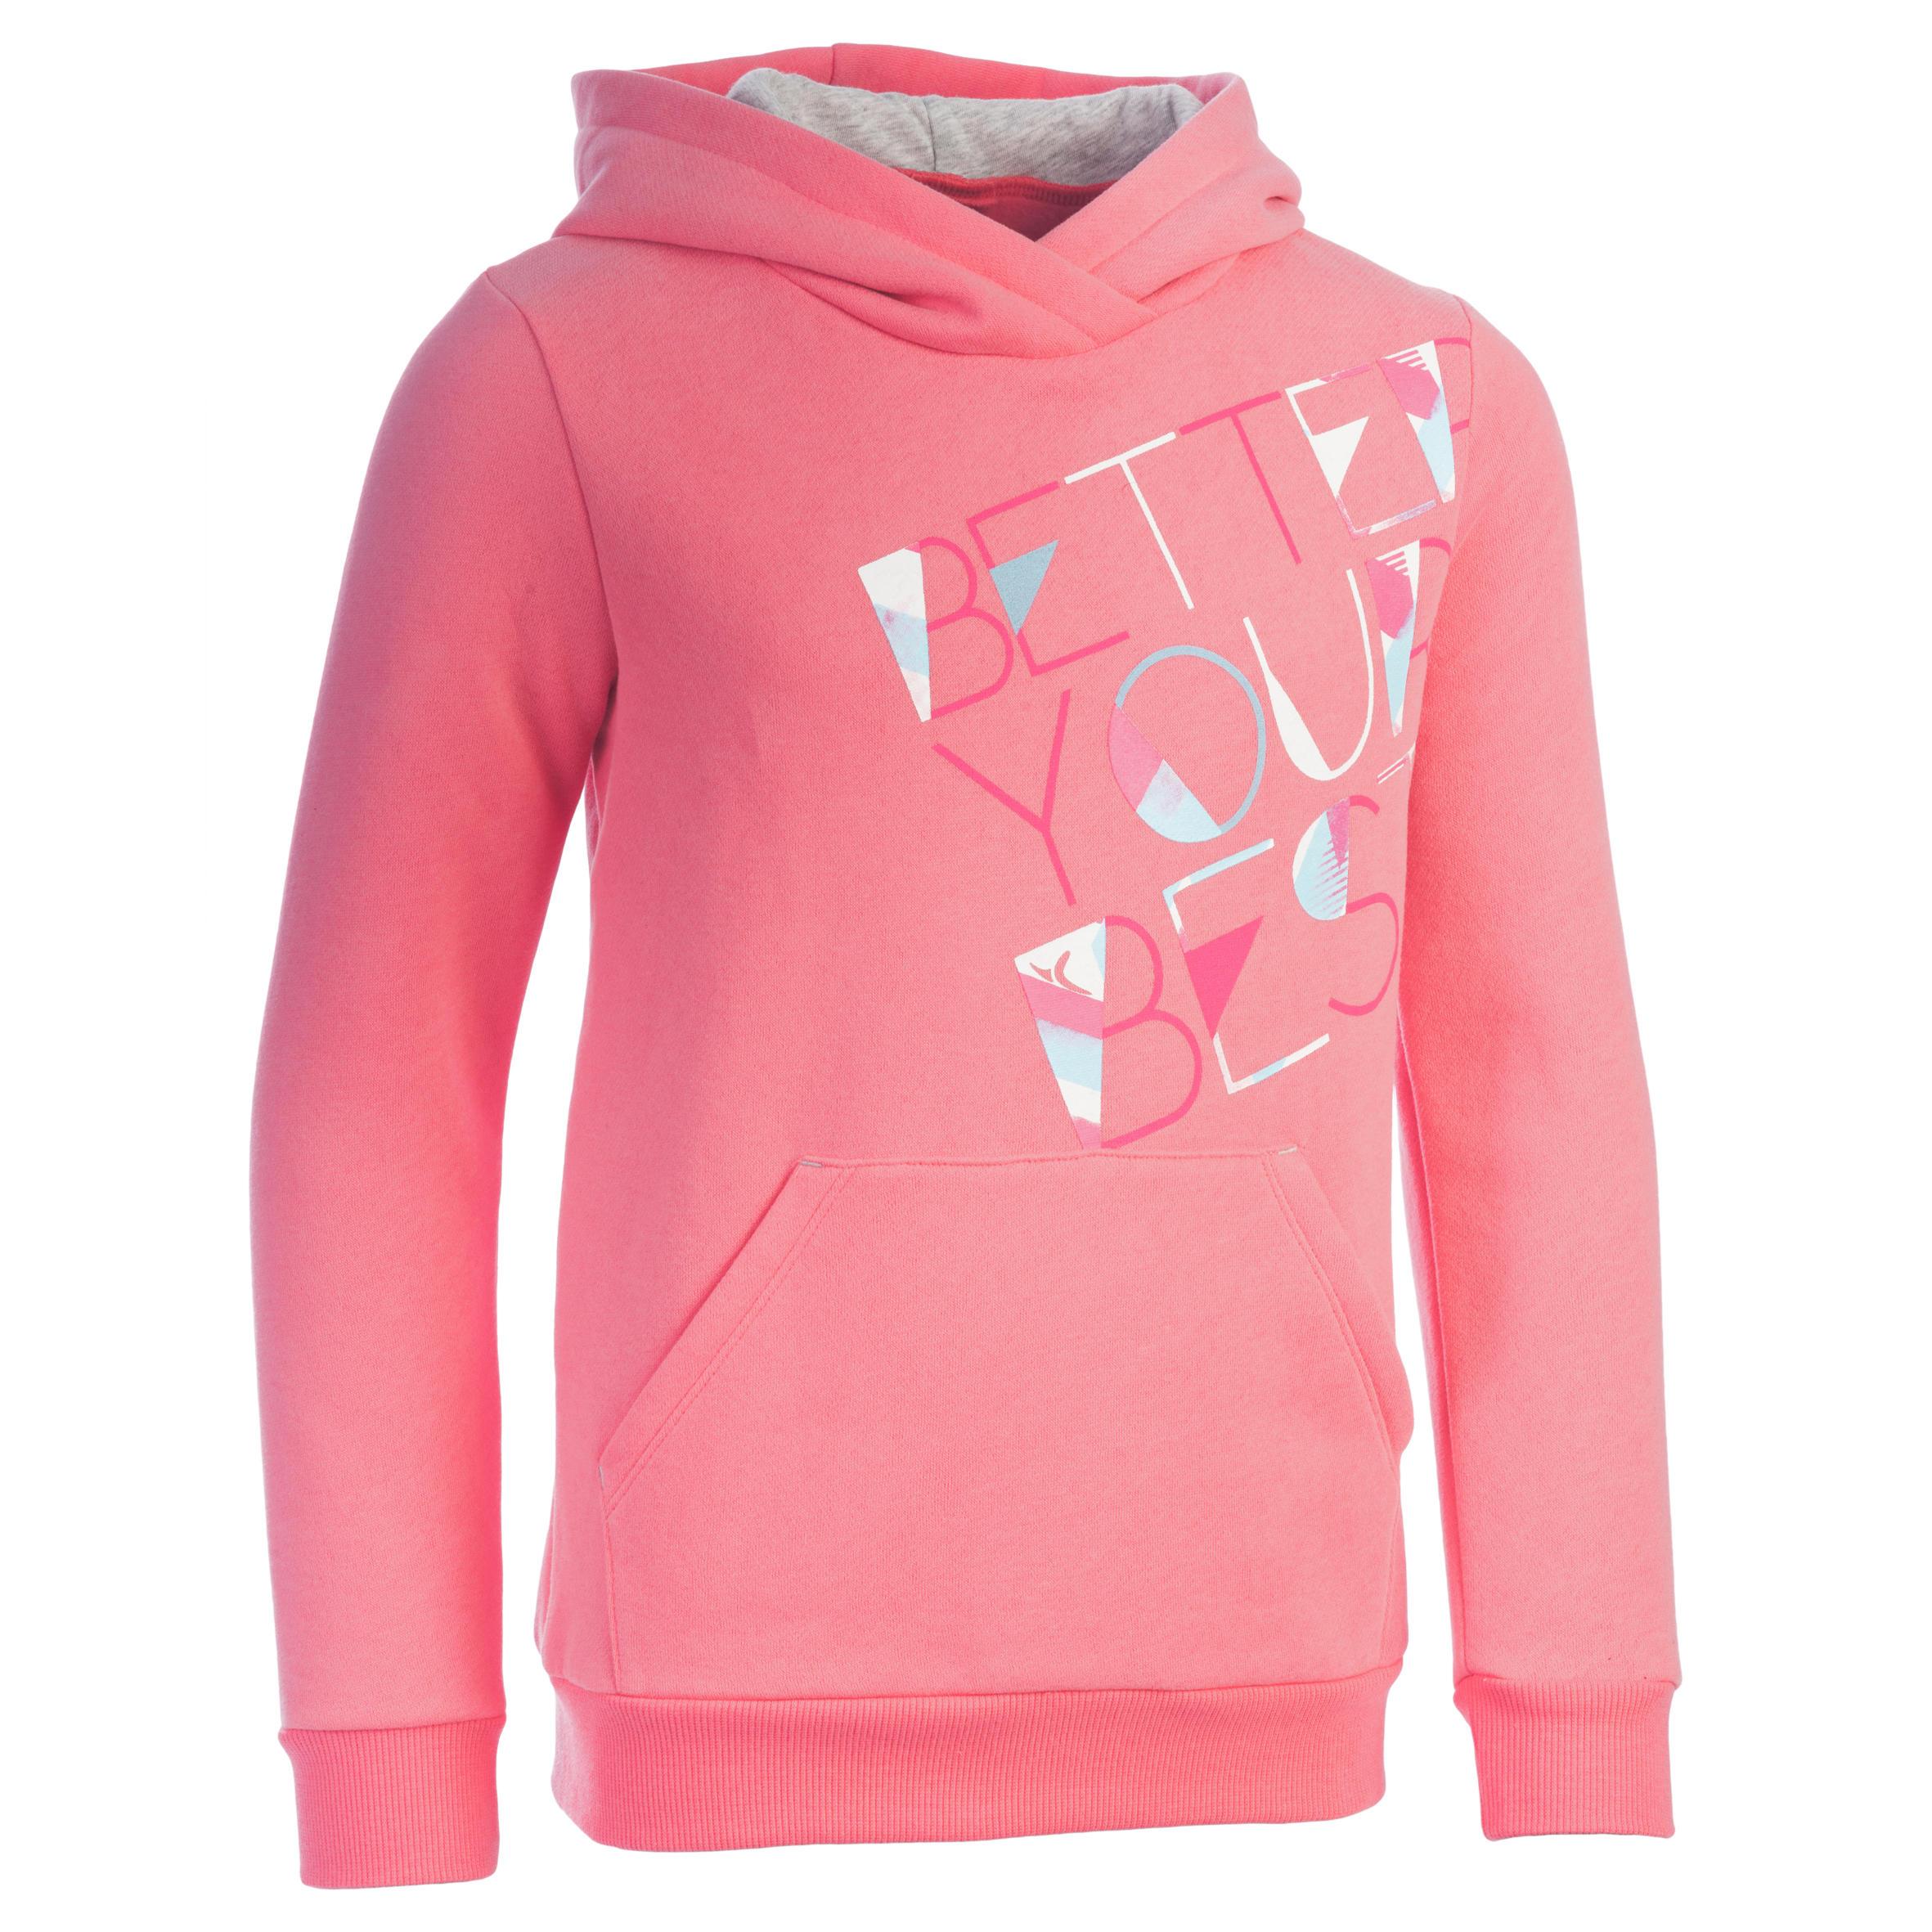 Sudadera 500 gimnasia niña capucha estampado rosa